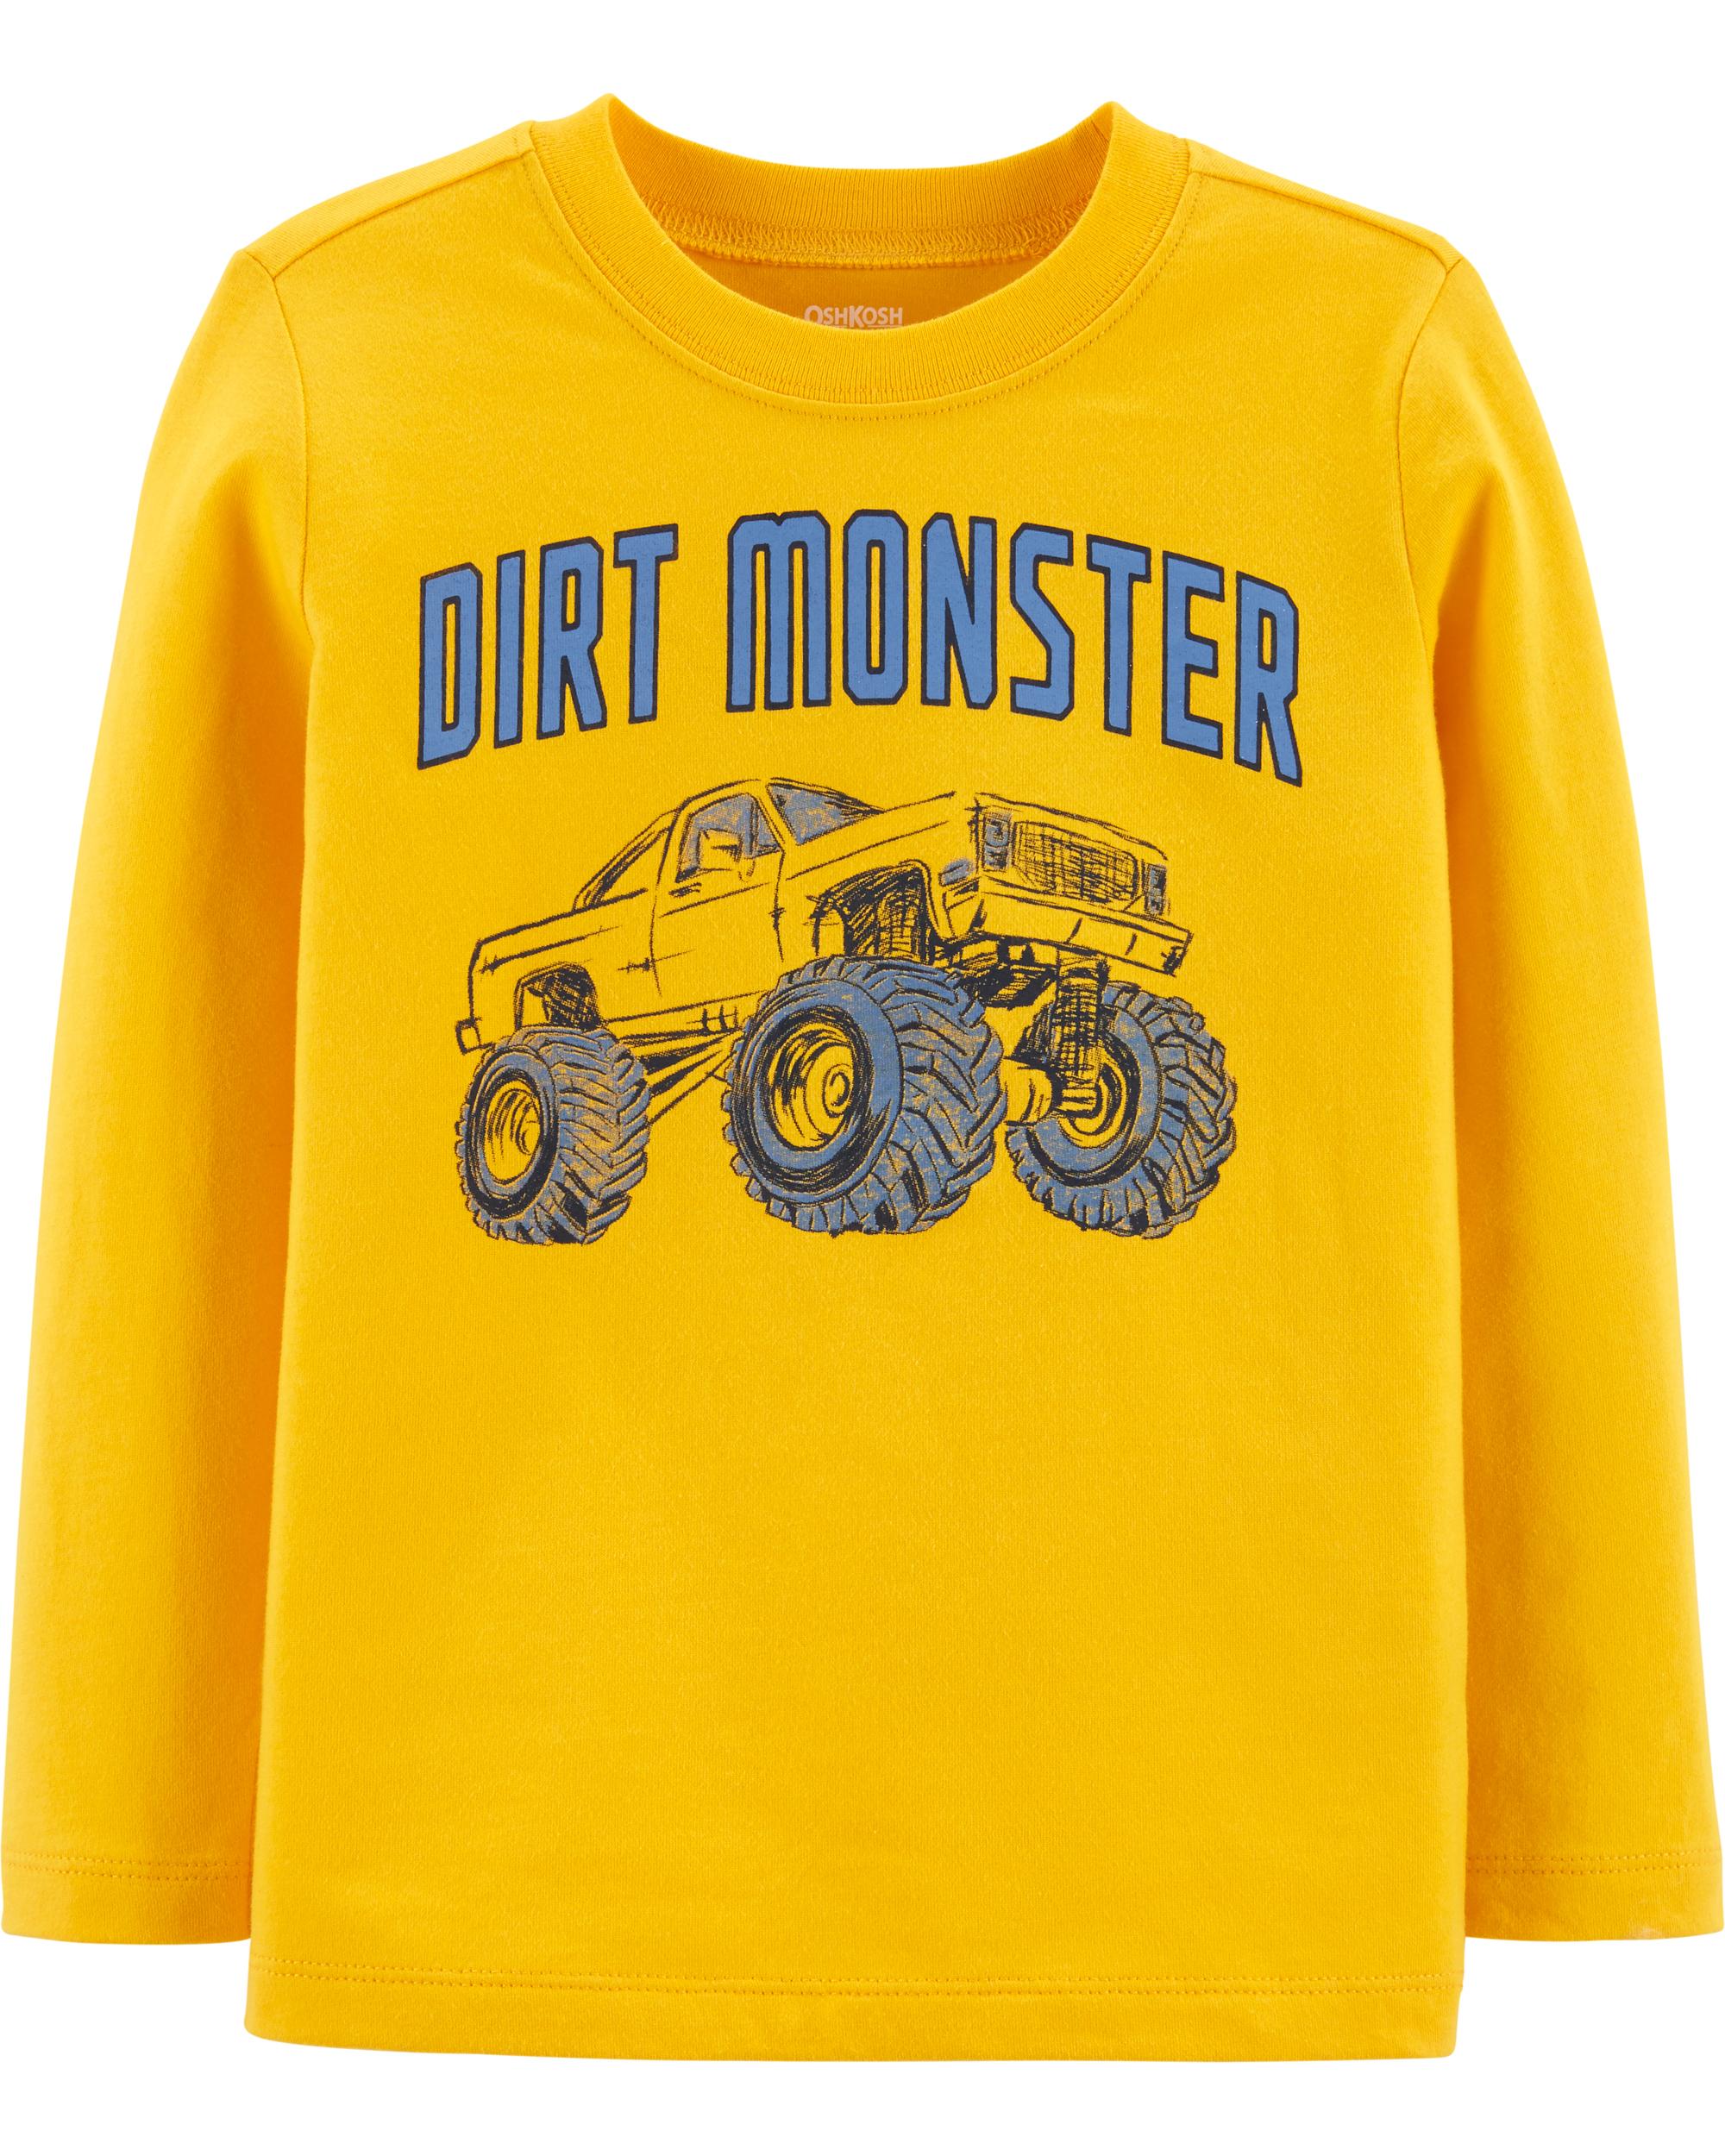 DIRT MONSTER חולצת